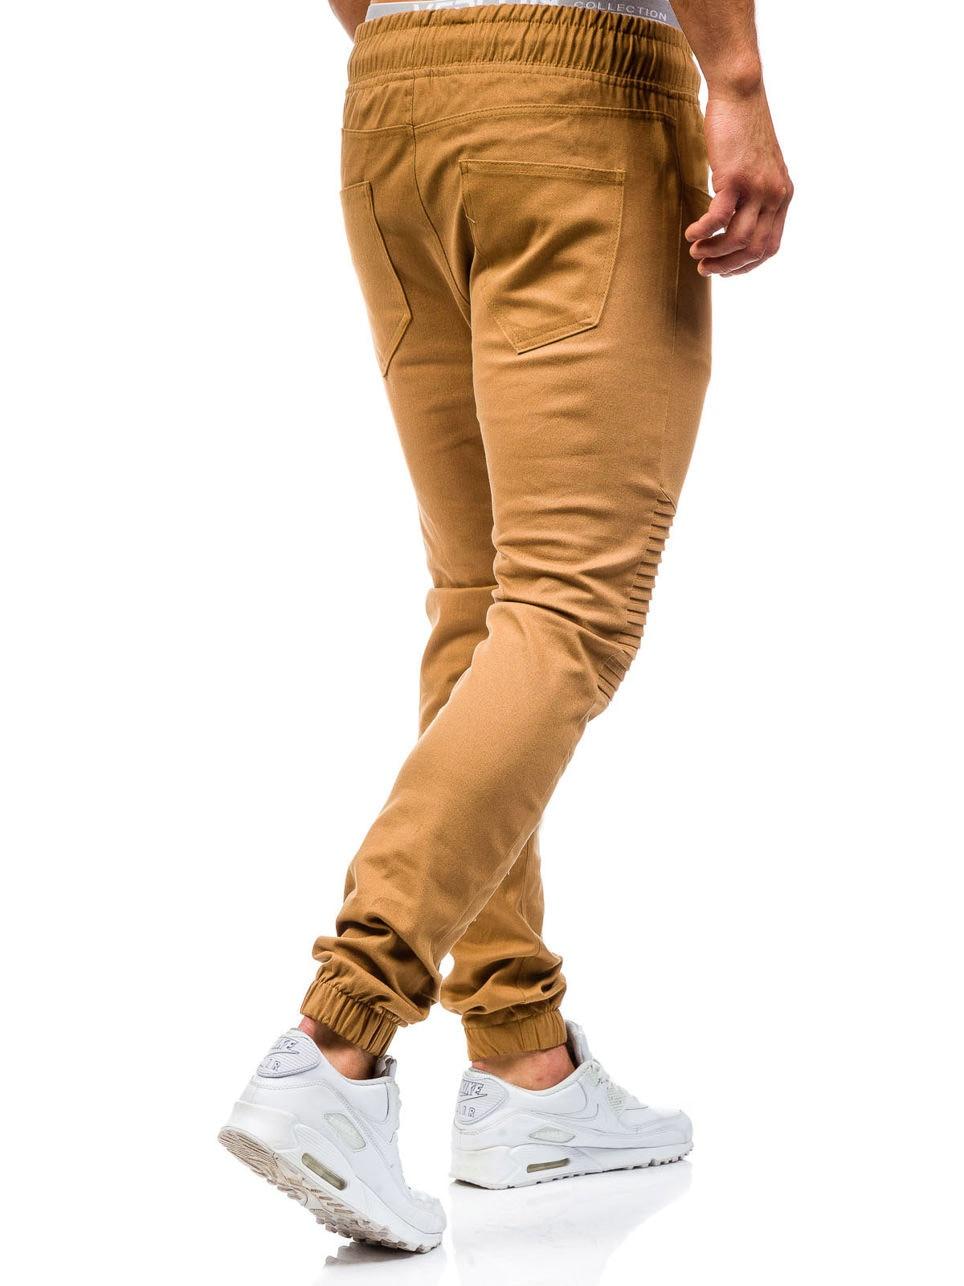 Men Sweatpants Casual Pants Slim fit Drawstring Sweatpants Slacks Elastic Waist Patchwork Pleated Ultrathin Male Trousers Jogger 12